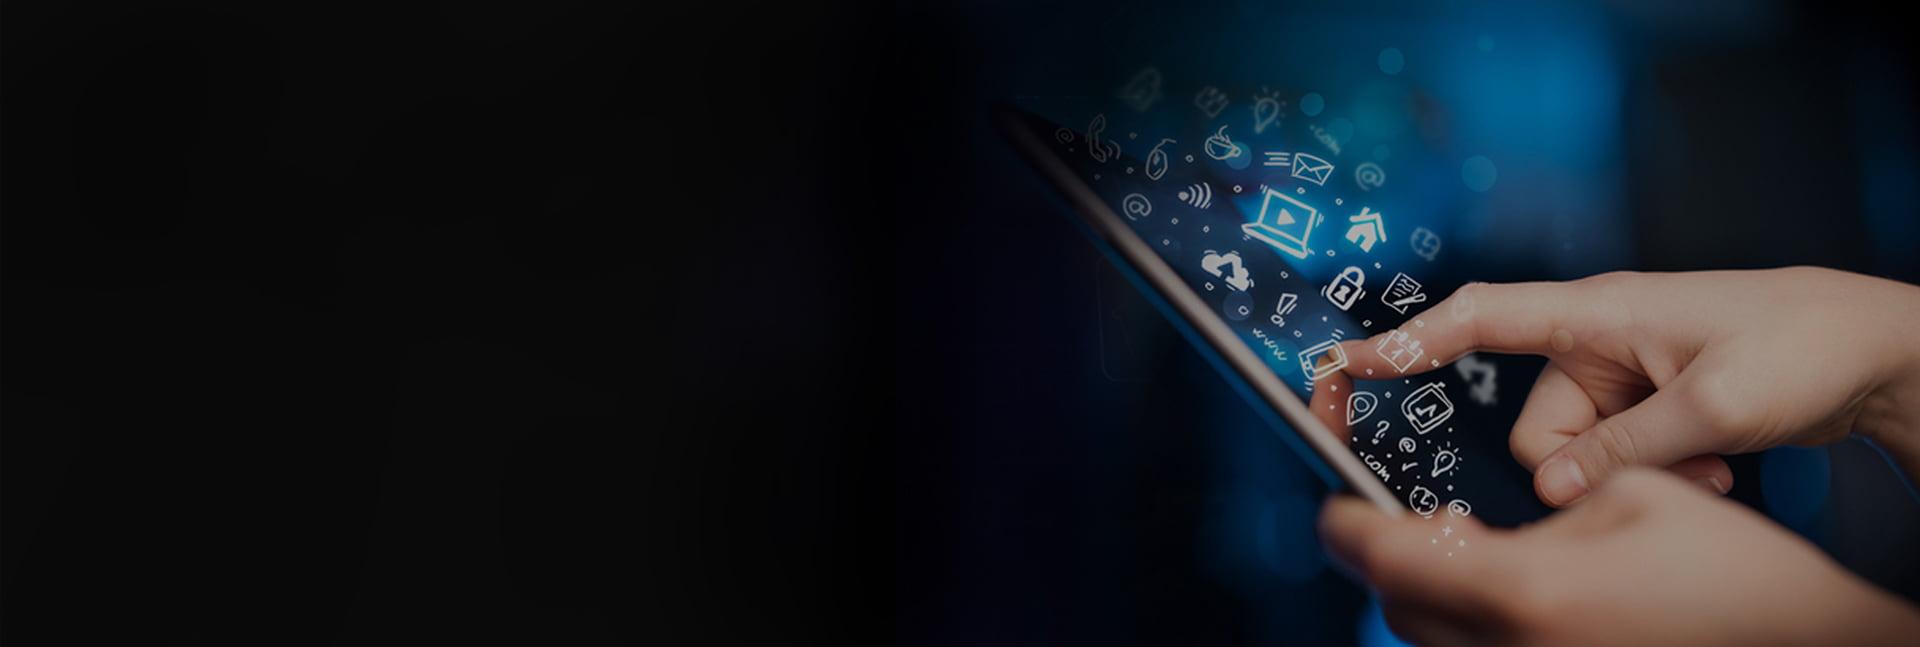 Hire Mobile App Developers | App Development Company Australia | Mobile App Development